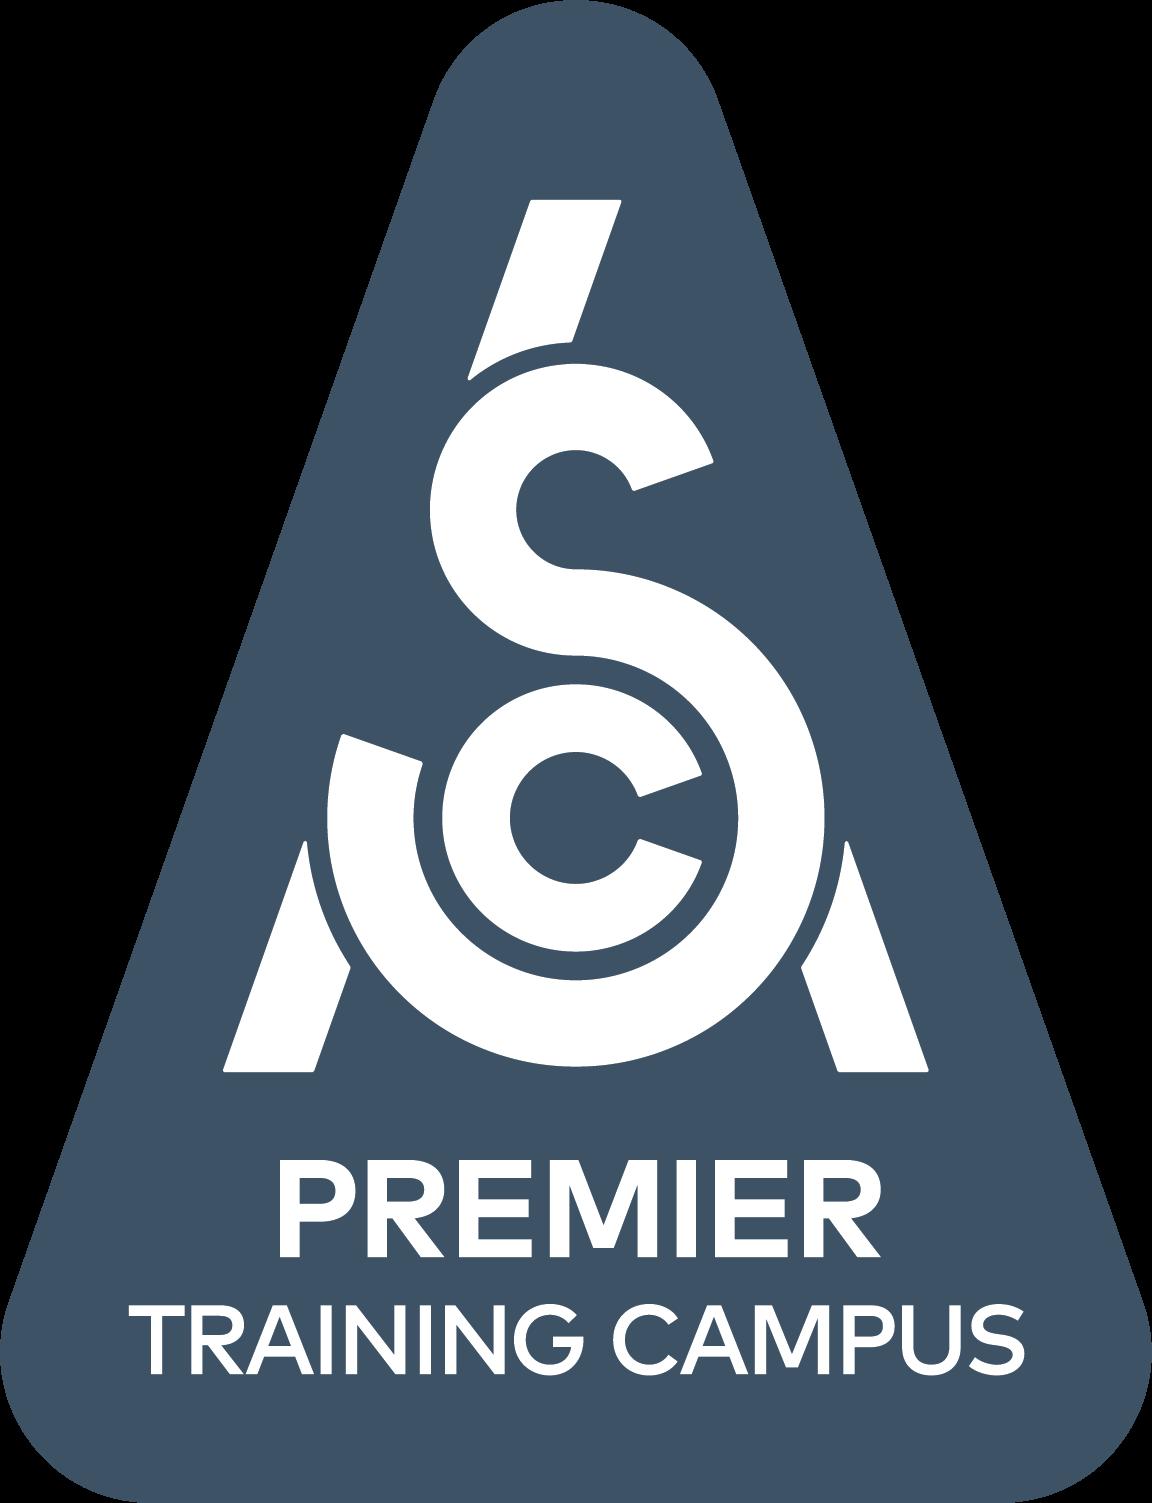 Premier Training Campus Mark - stone